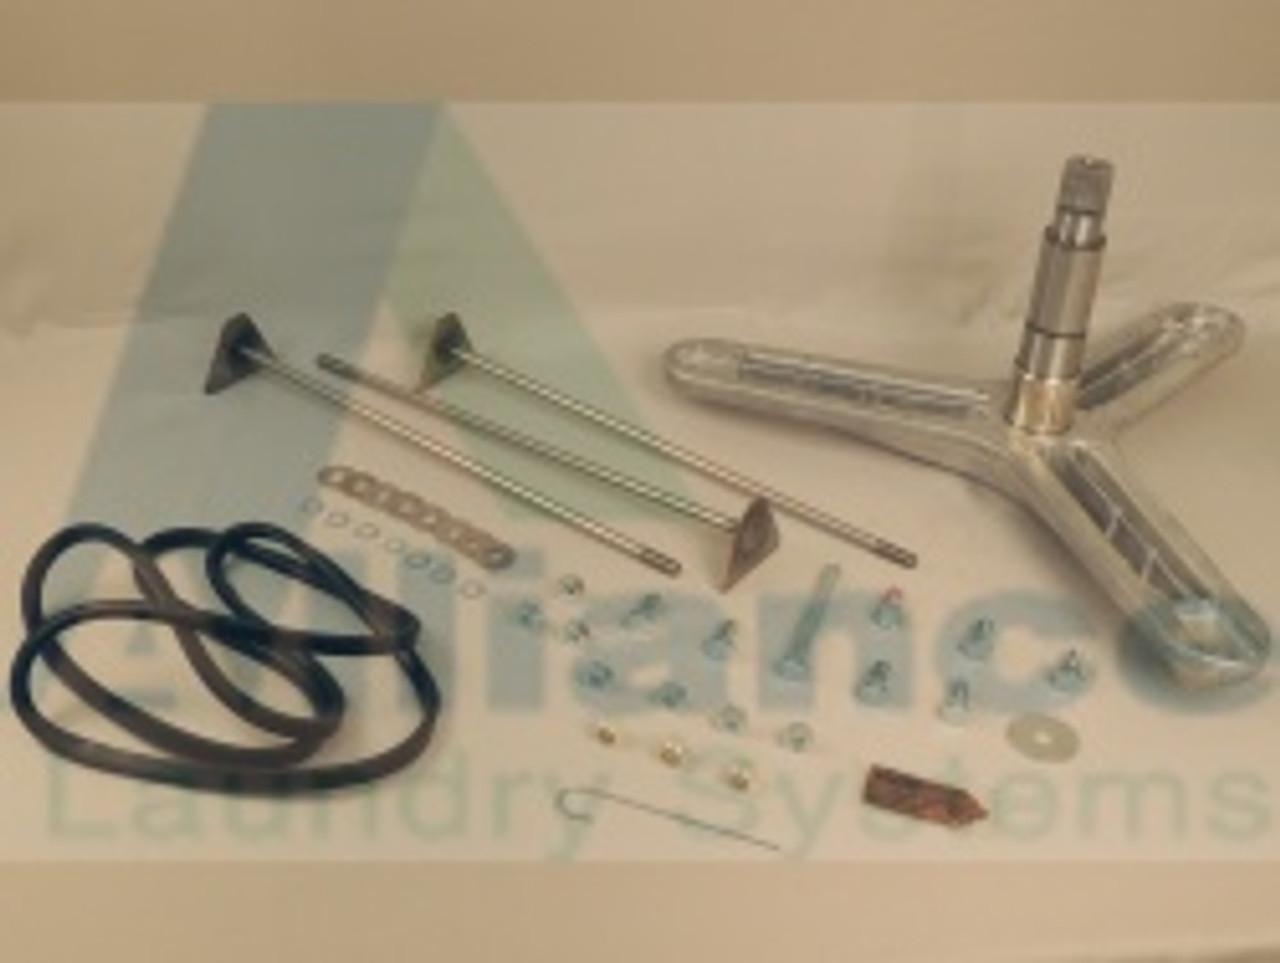 800749p Trunnion Shaft Hardware Kit Parts4laundry Com